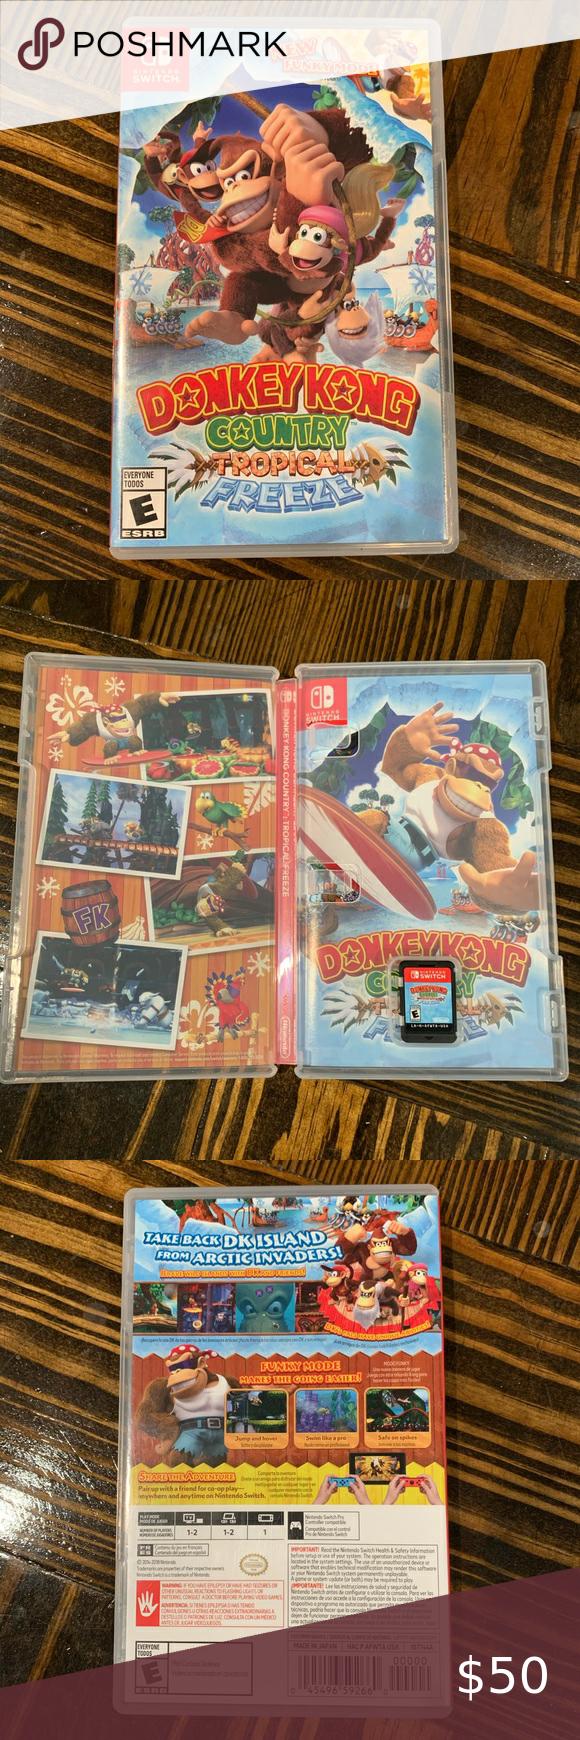 Donkey Kong For Nintendo Switch Donkey Kong Nintendo Switch Nintendo